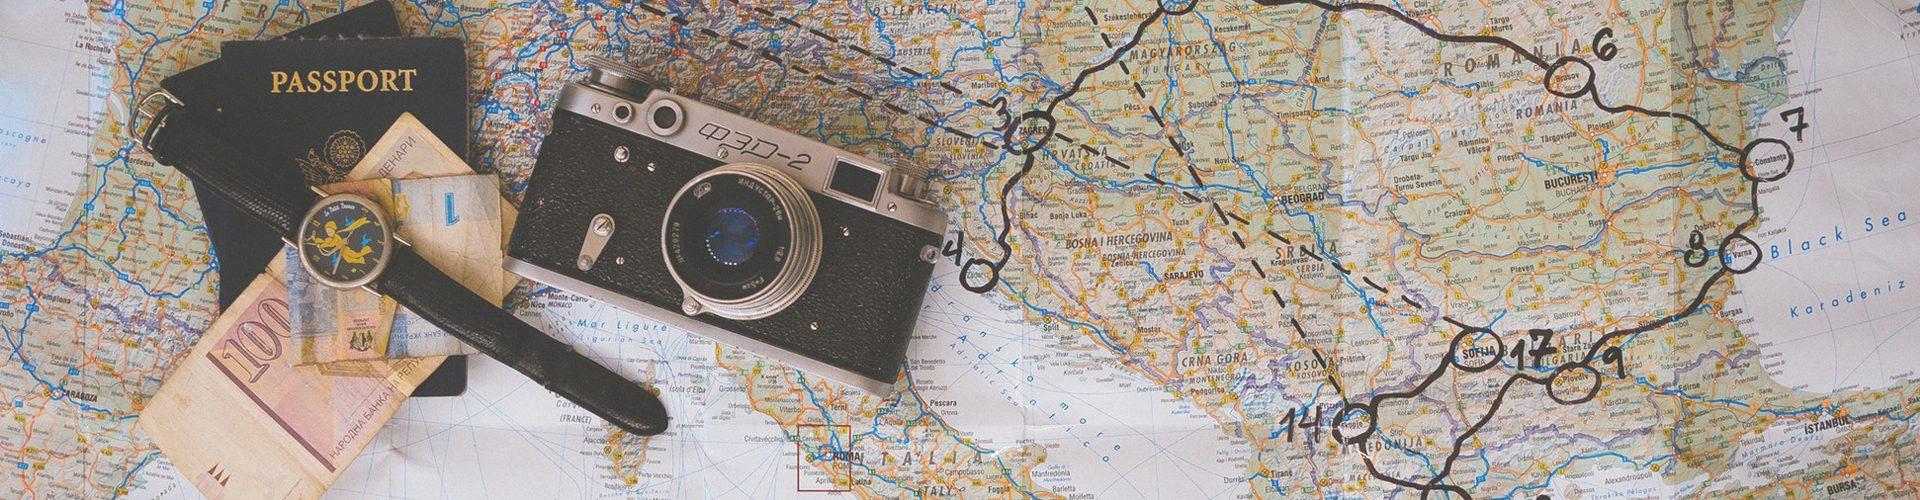 saving money - cash and passport on a map